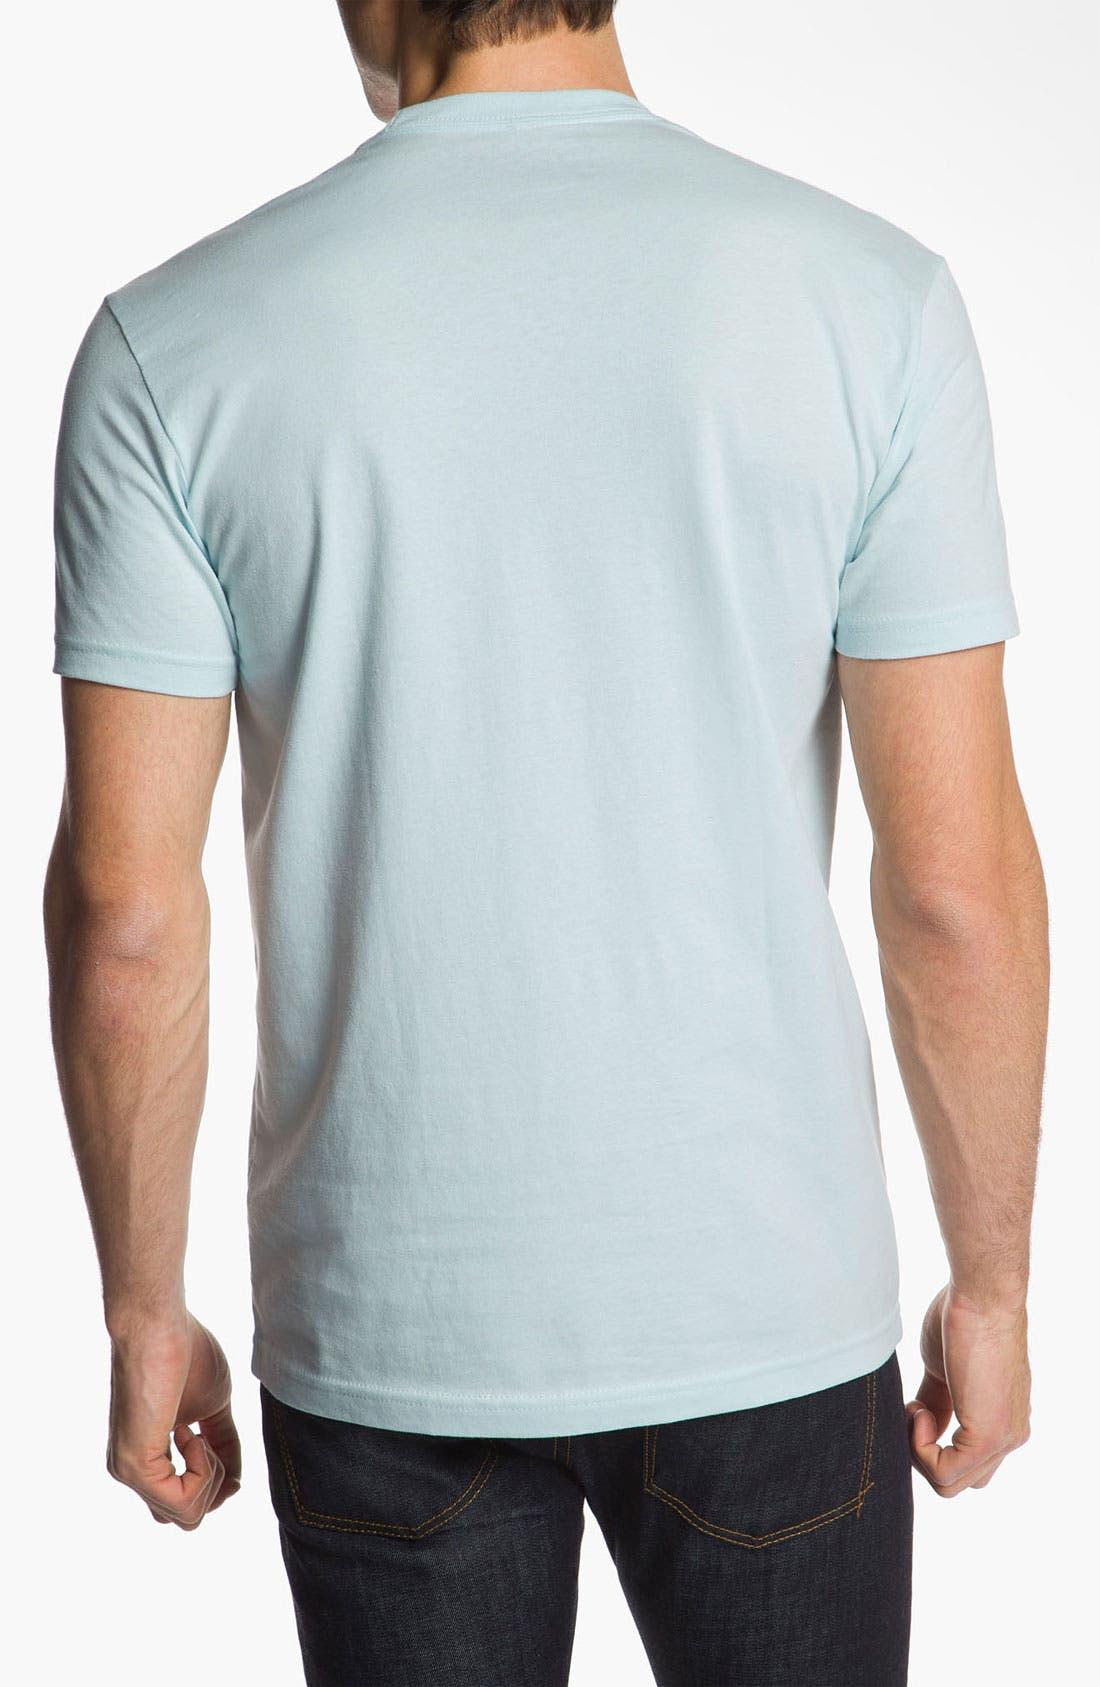 FYASKO,                             'Knew Stile' T-Shirt,                             Alternate thumbnail 2, color,                             450